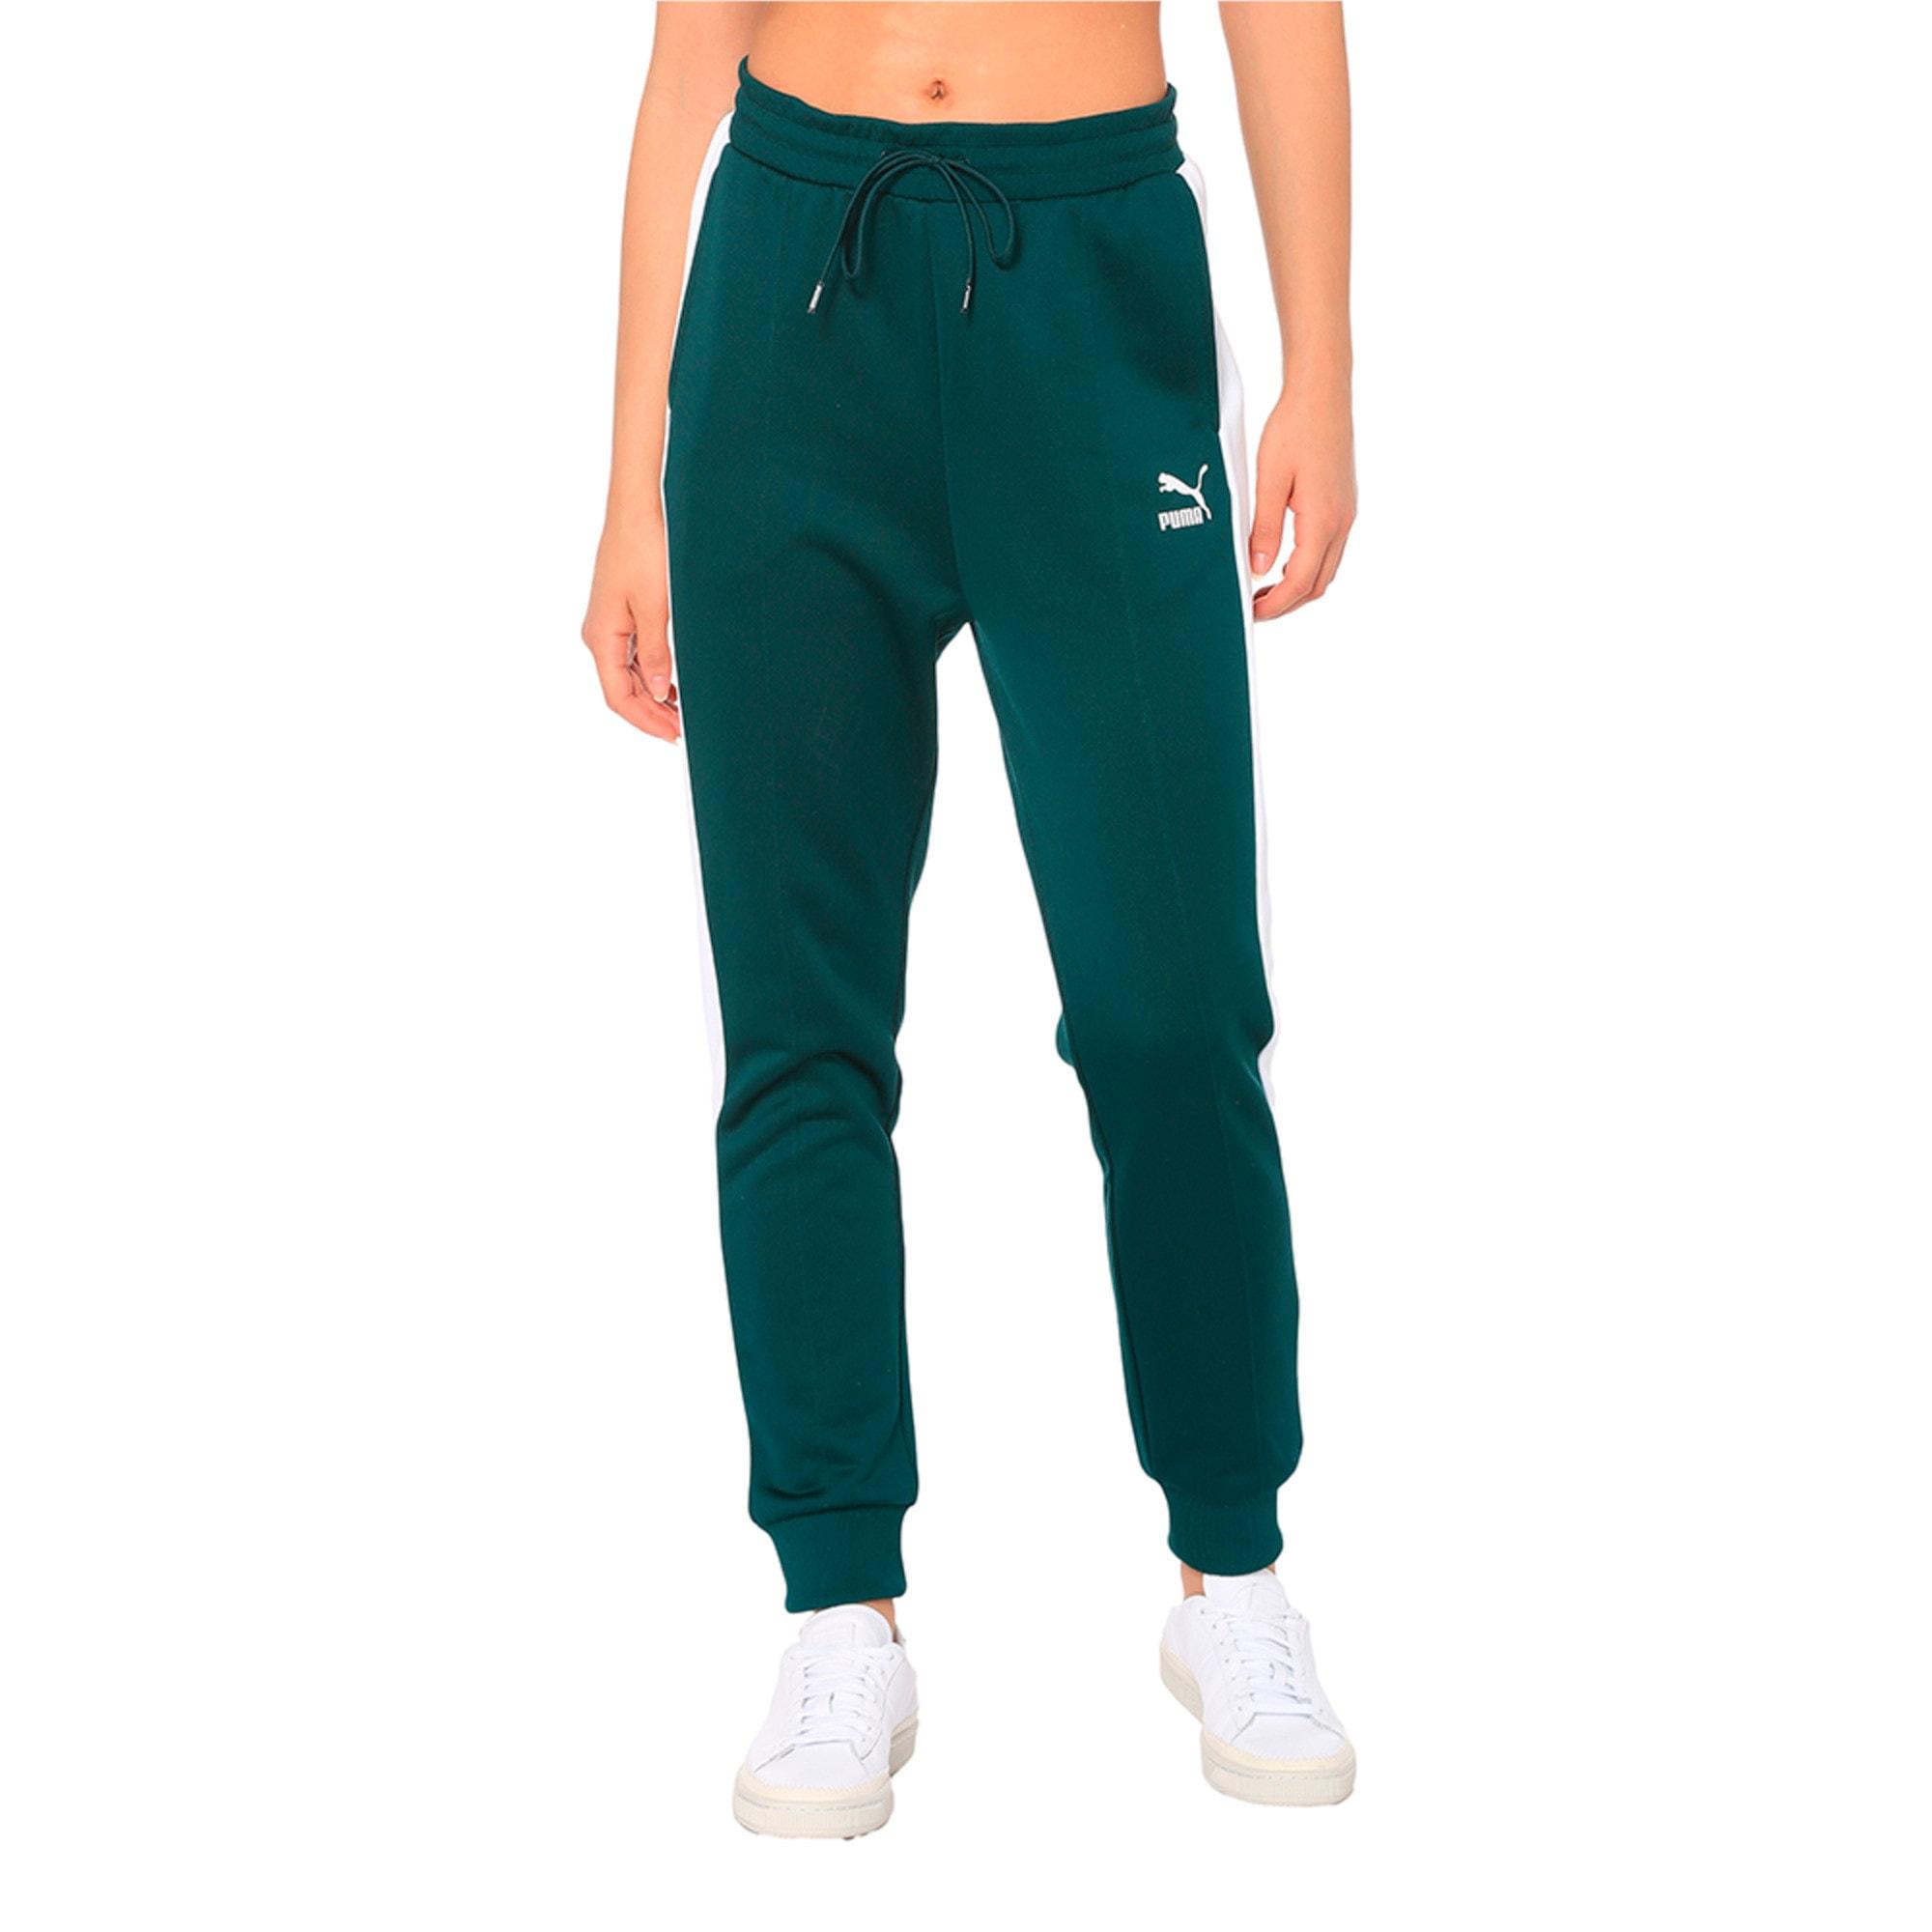 Thumbnail 1 of Classics T7 Knitted Women's Track Pants, Ponderosa Pine, medium-IND